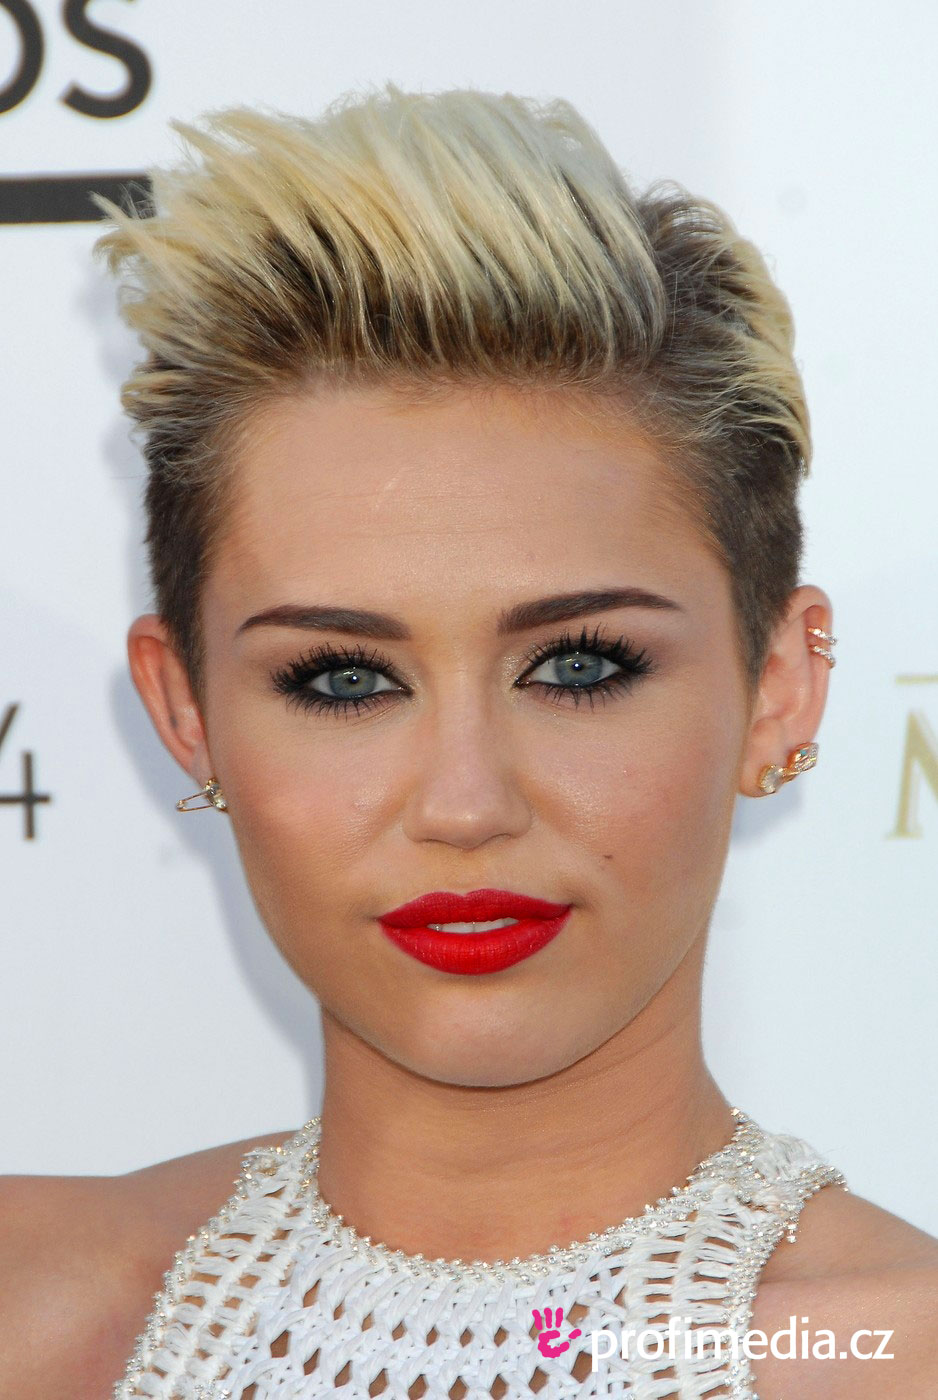 Miley Cyrus i Liam Hemsworth: ŚLUB już w 2016 roku? Miley